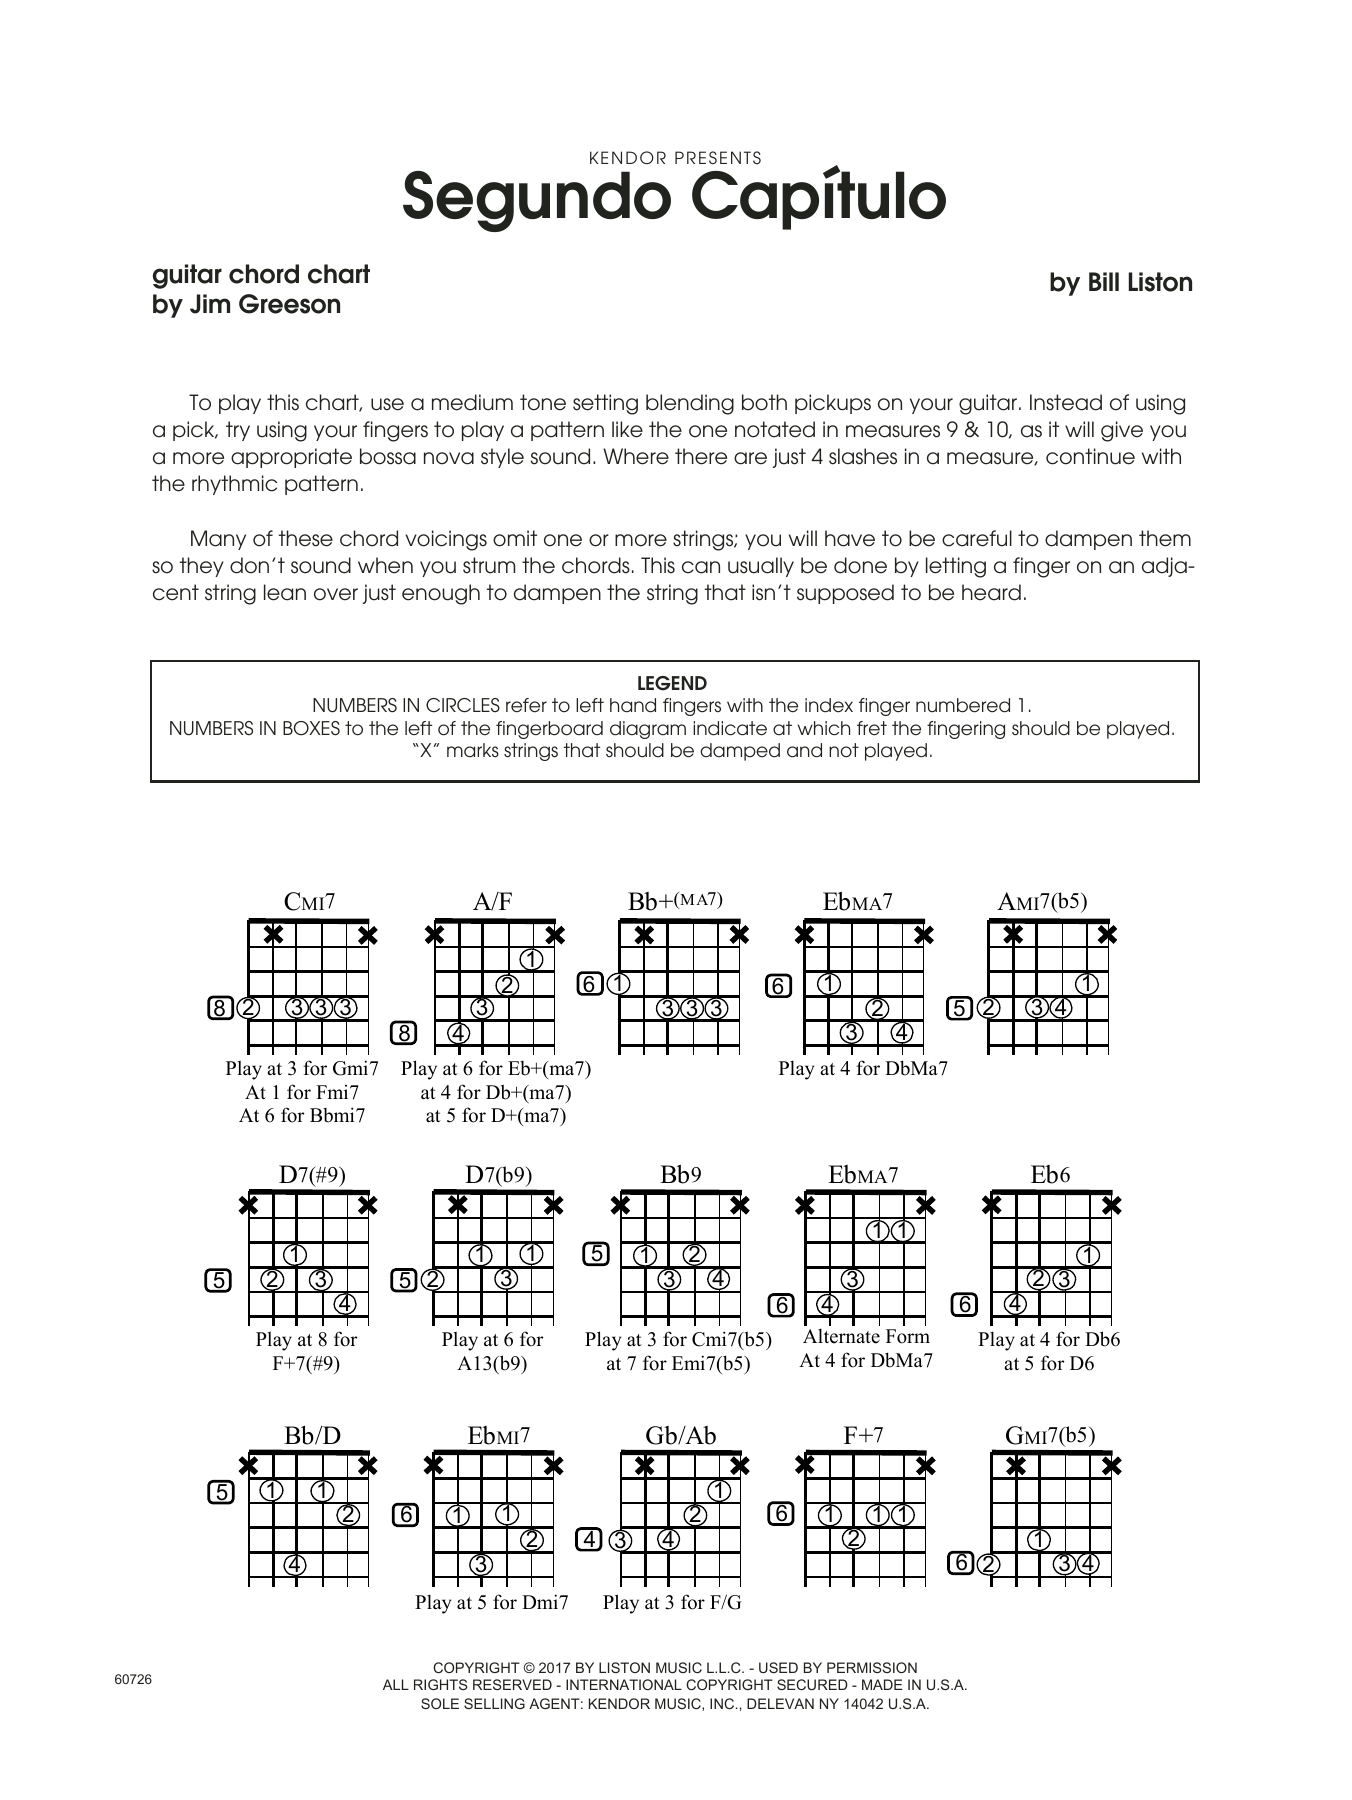 Bill Liston Segundo Capitulo - Guitar Chord Chart sheet music notes printable PDF score